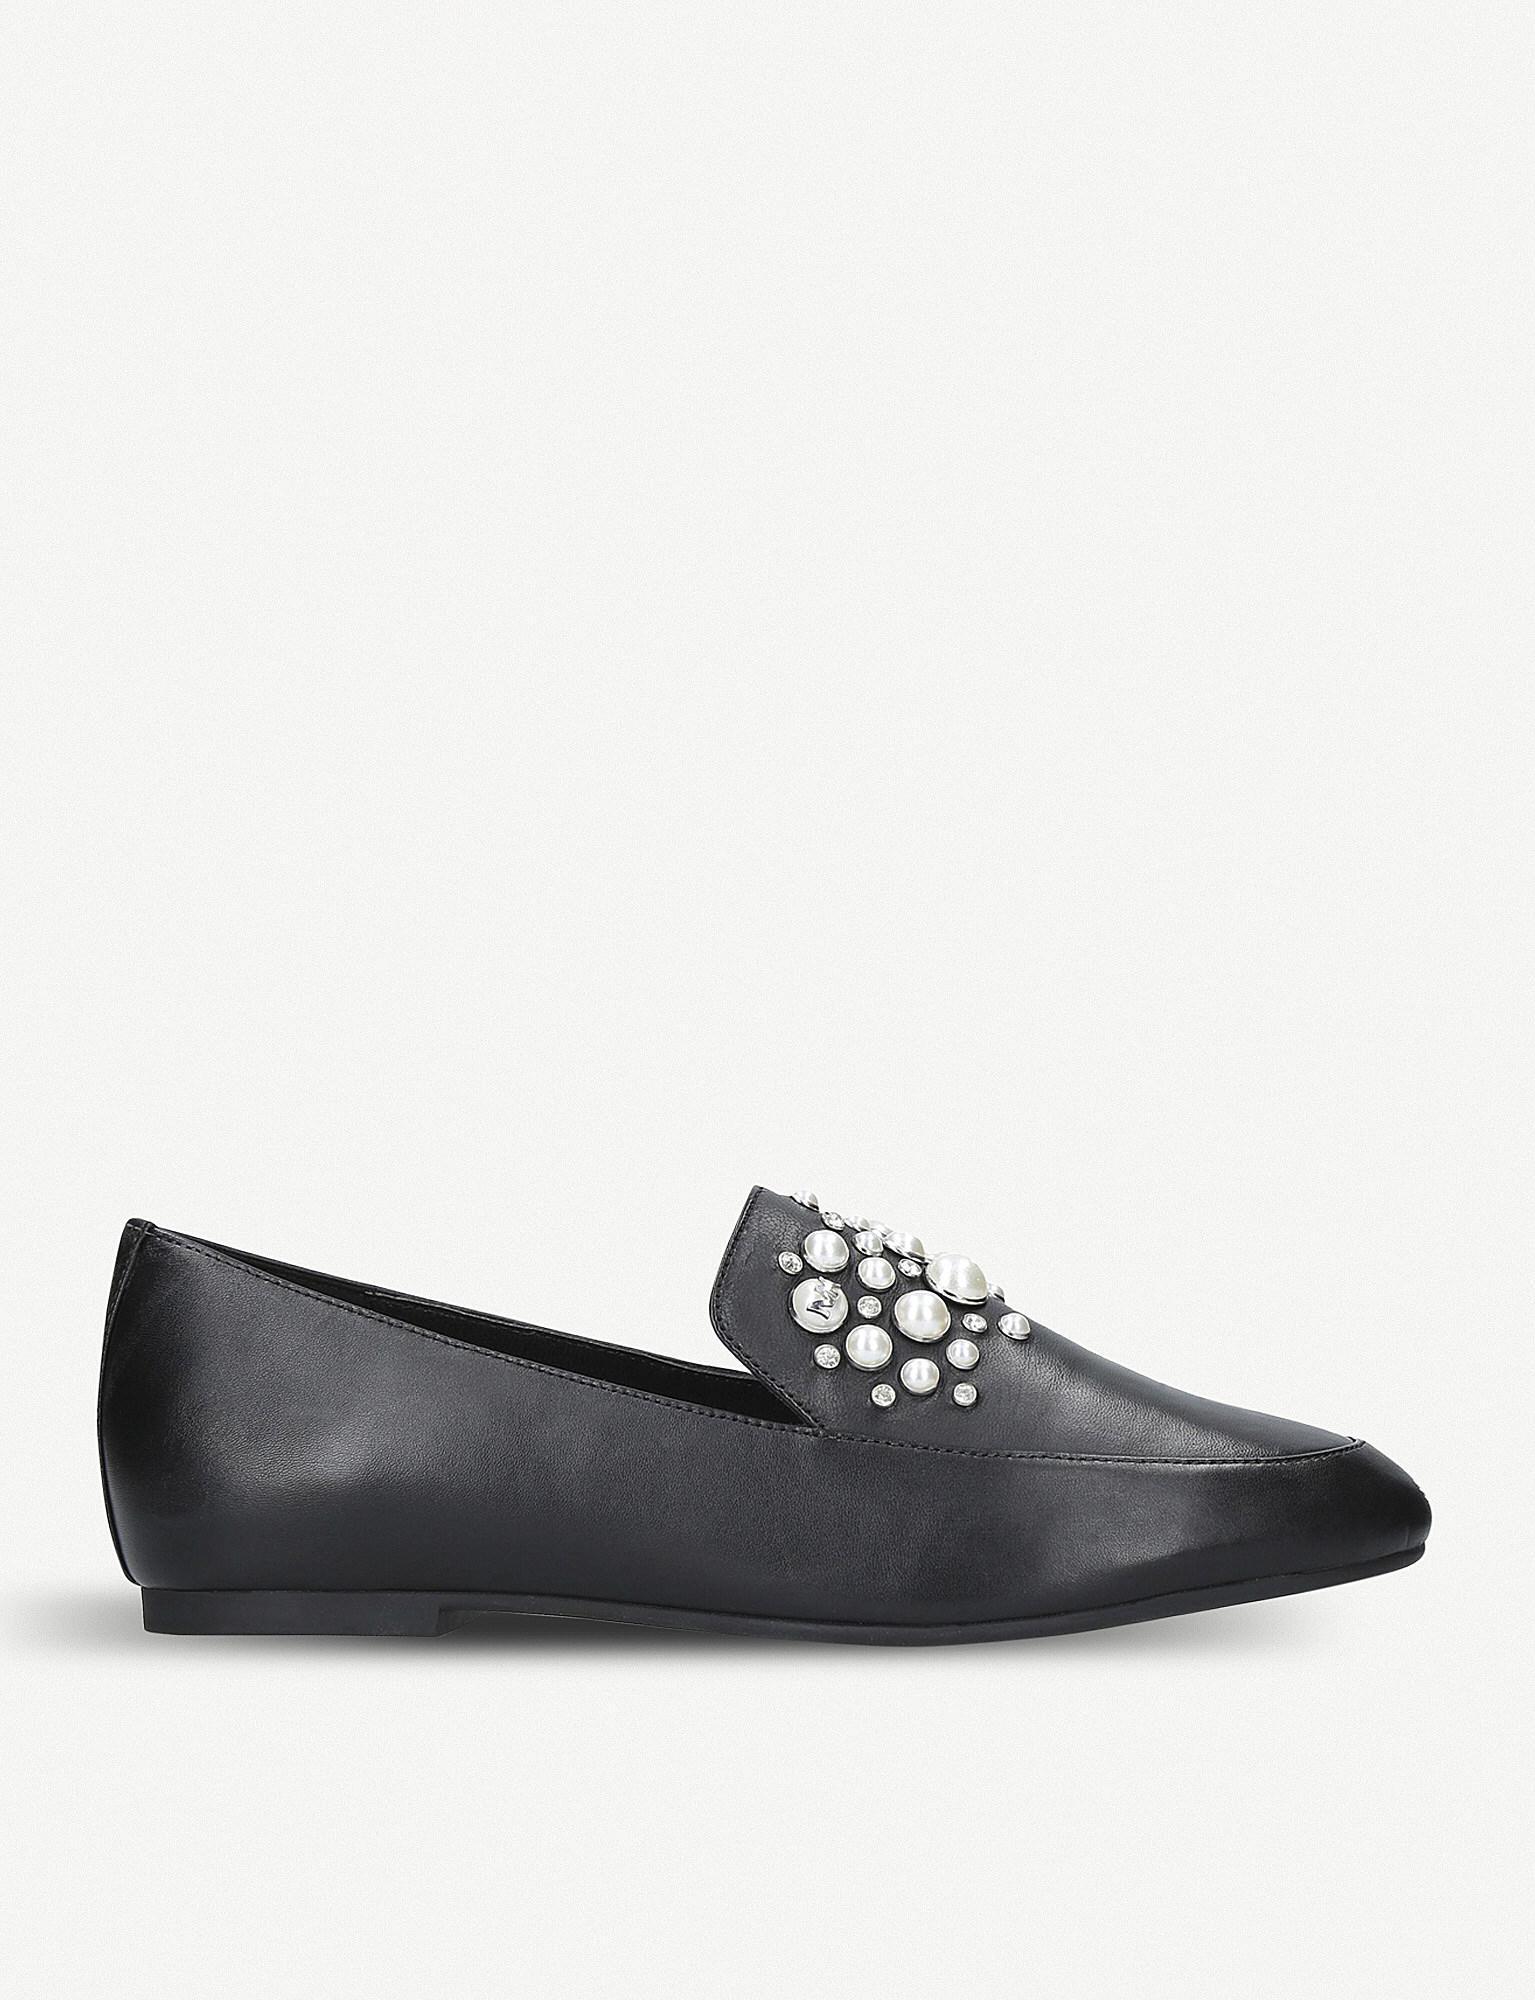 Gia embellished loafers - Black Michael Michael Kors U2Fcpbj